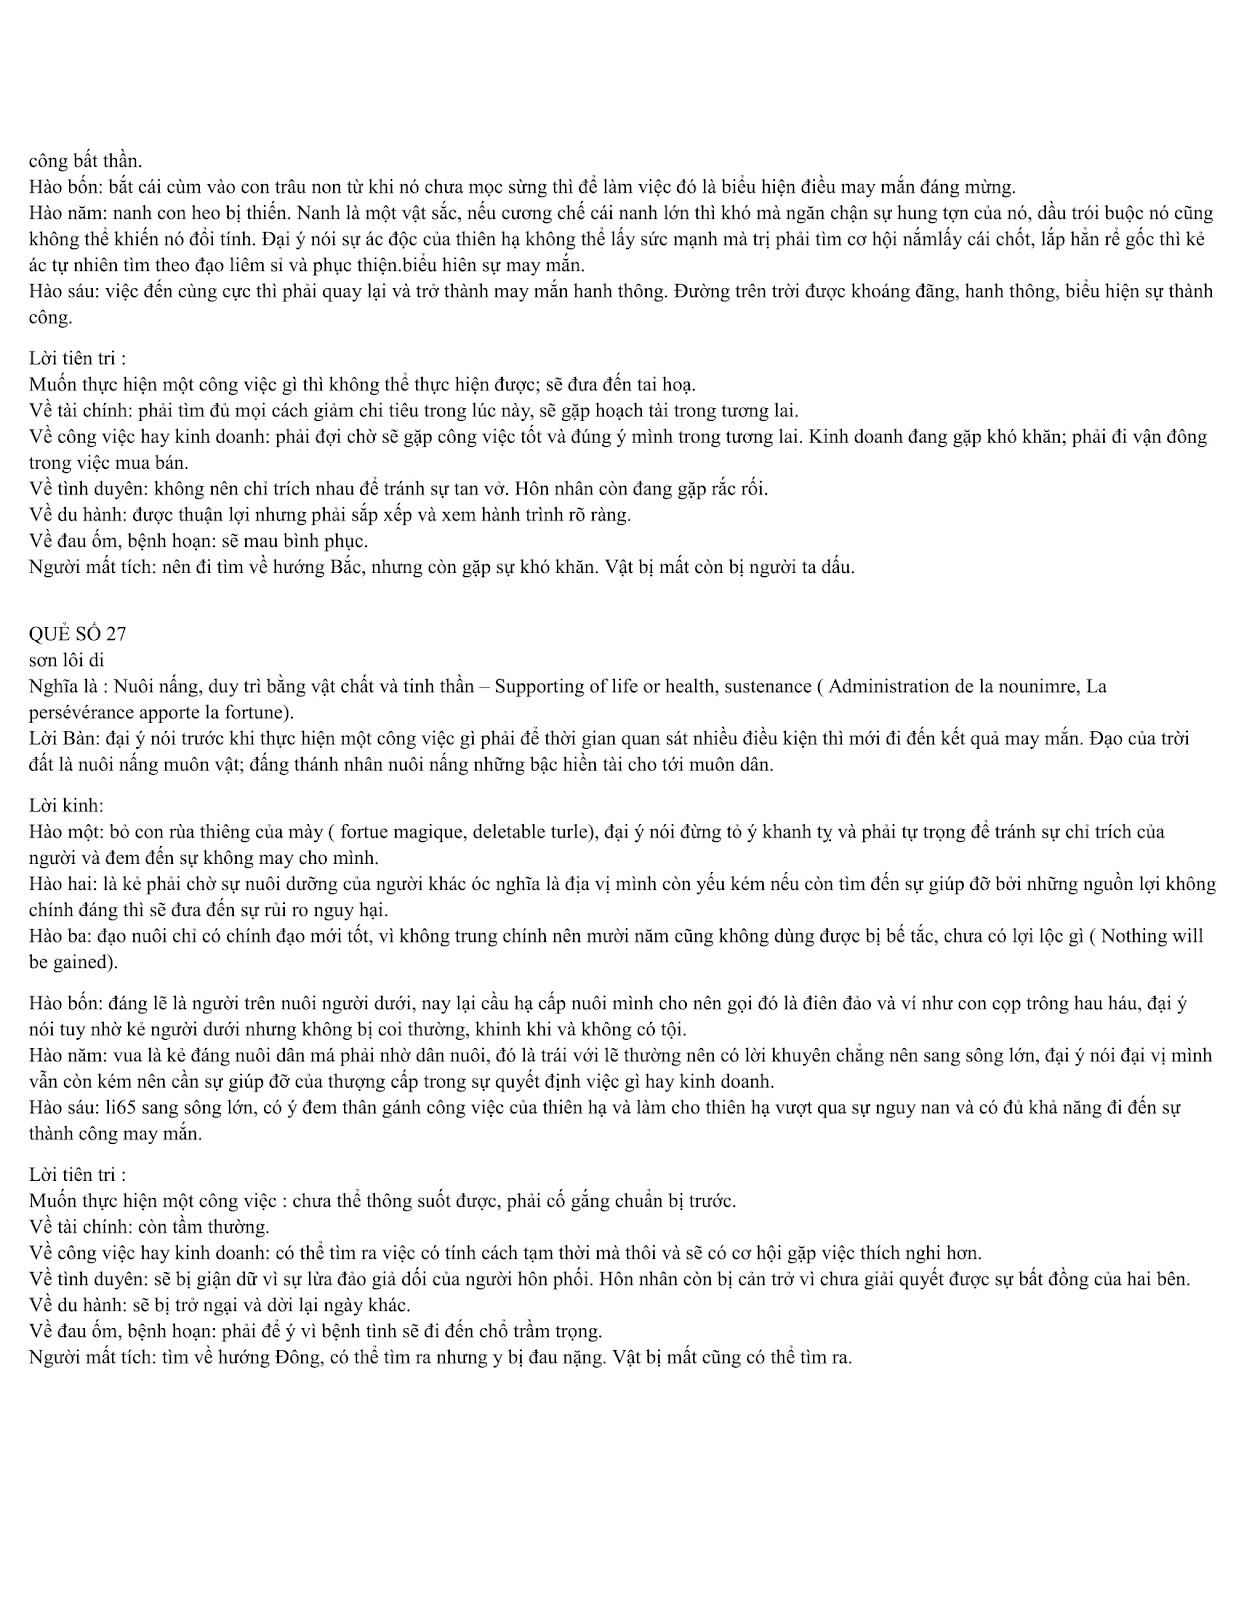 QUẺ SỐ 1-14.jpg